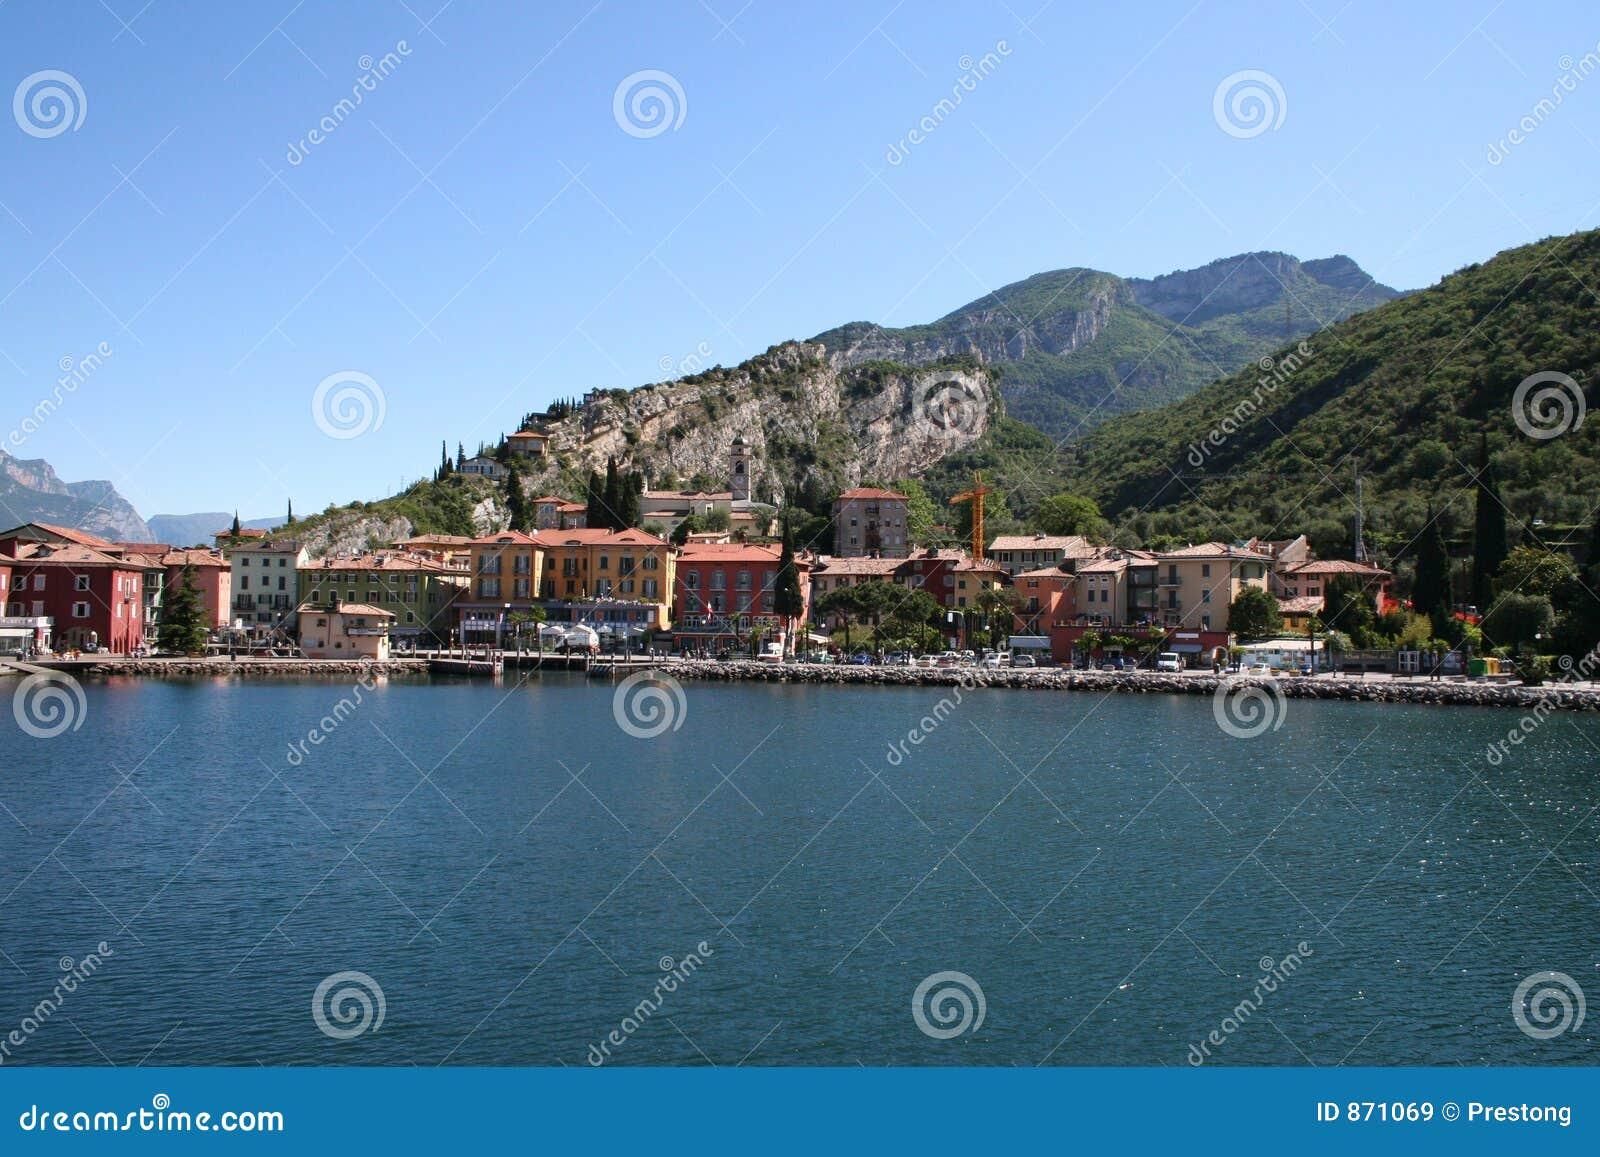 Torbole, Lake Garda, Italy.